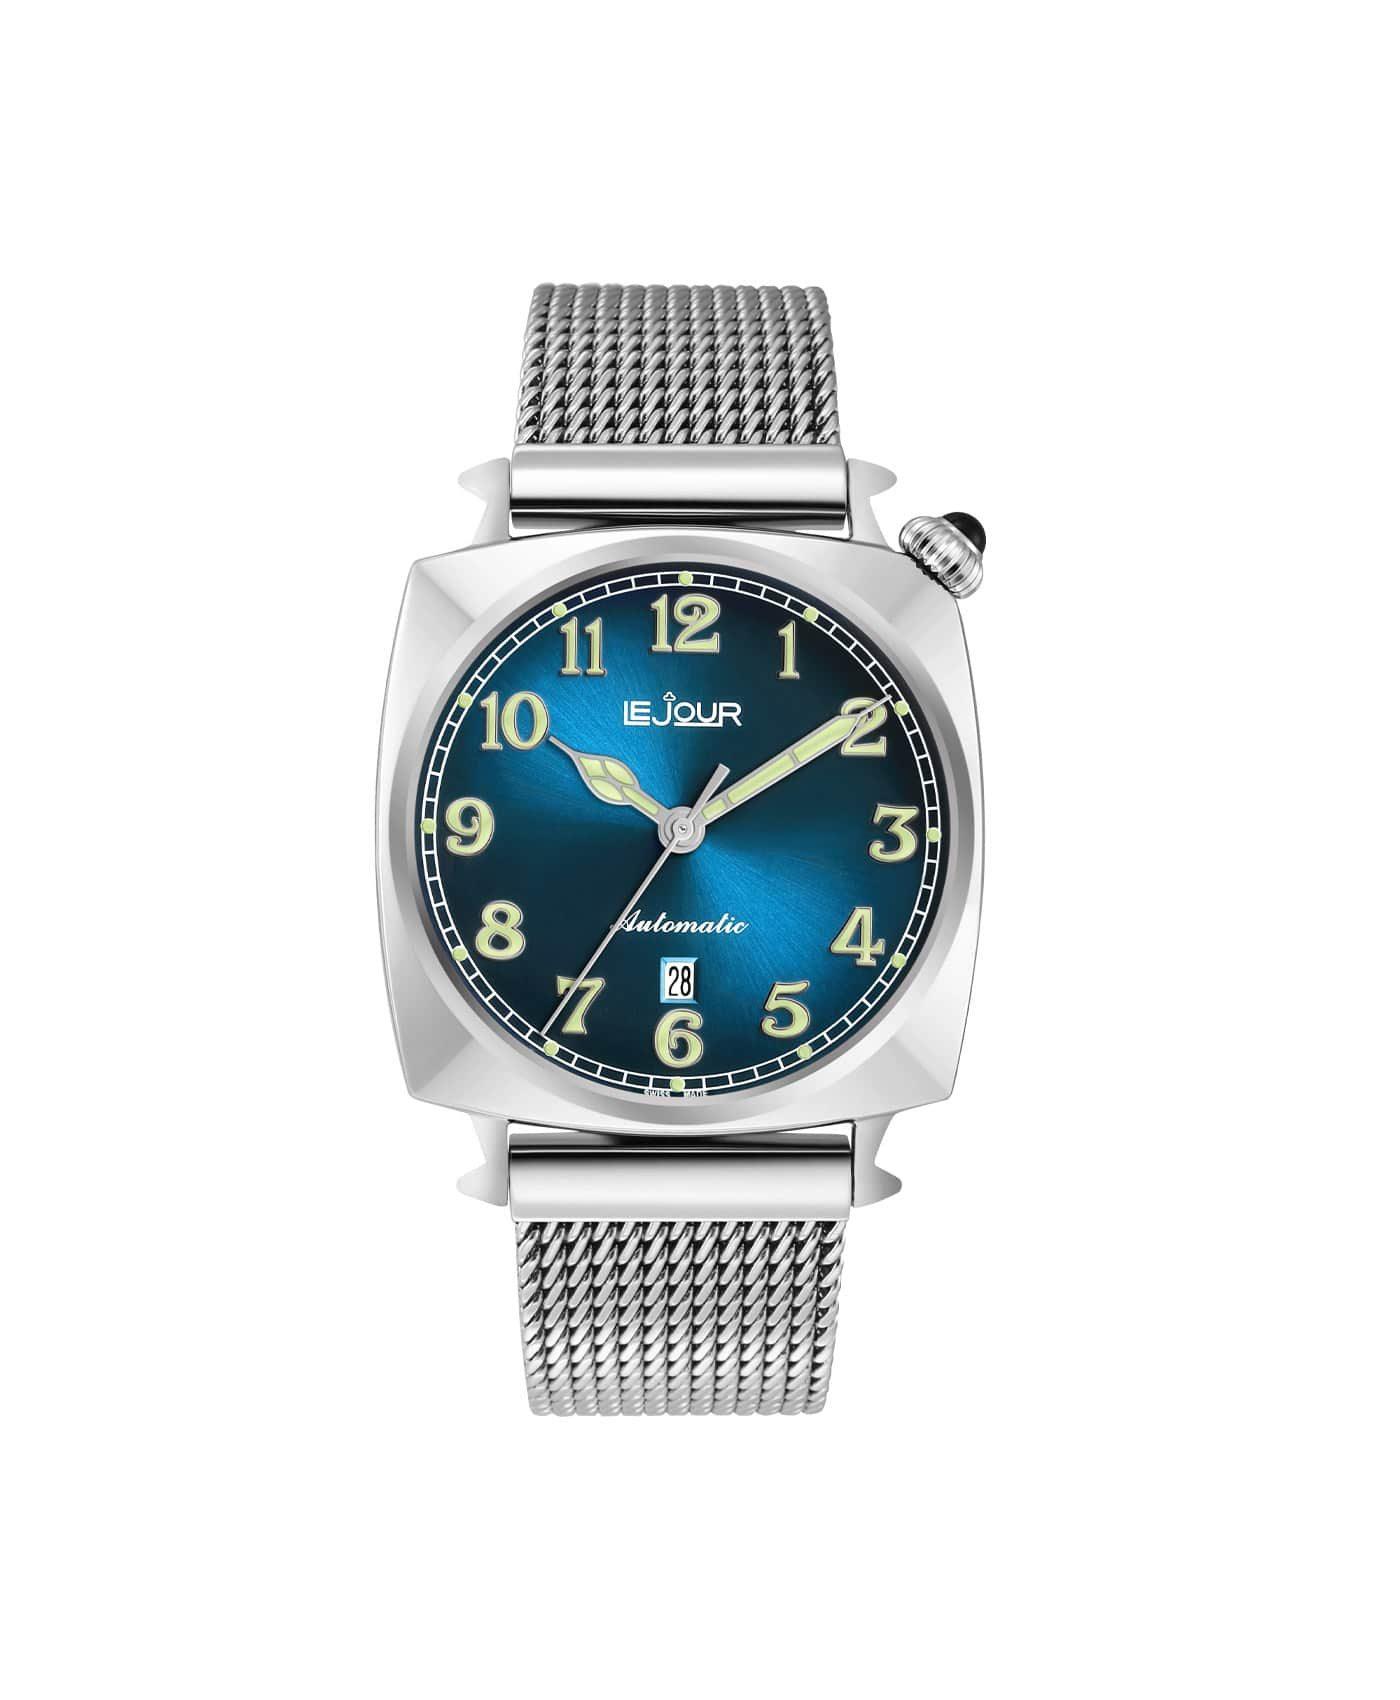 LJ-HR-002 blue sunray dial Front